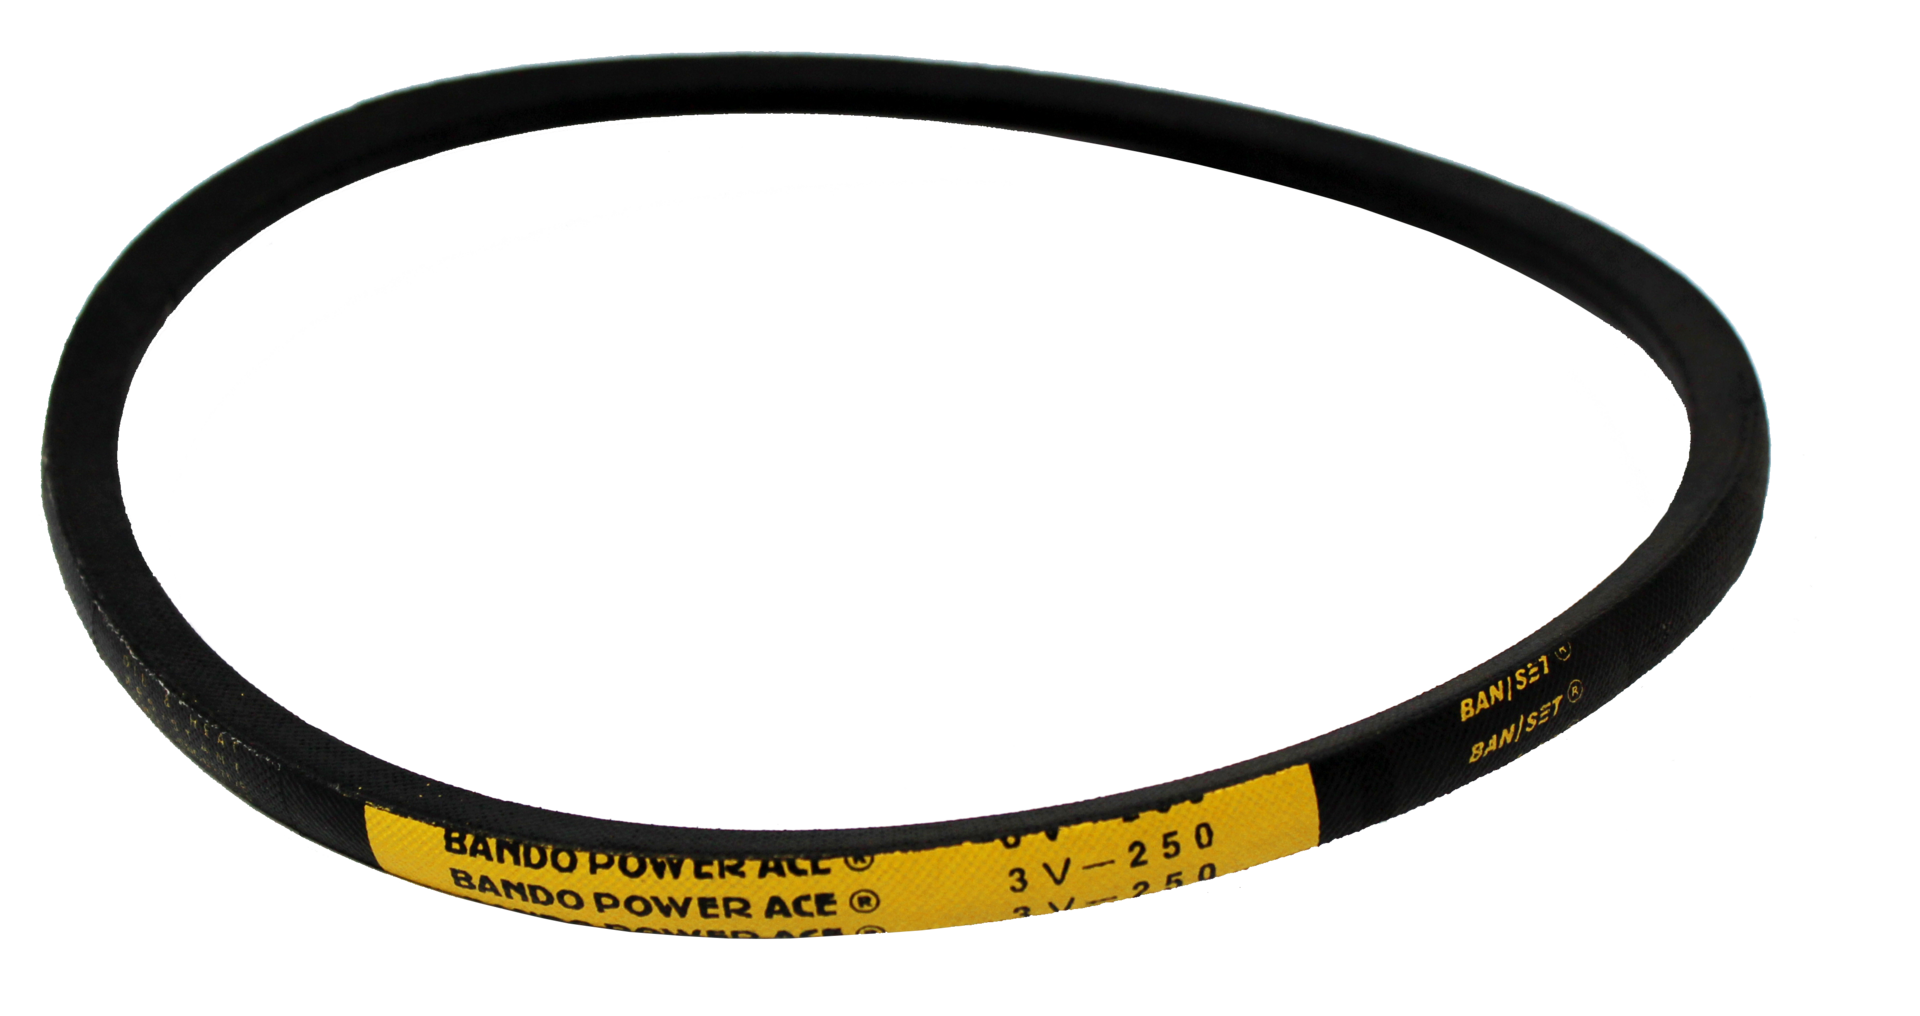 B16 Bando Power Ace Cog 5VX1700 Belt Super Free Shipping New Loose